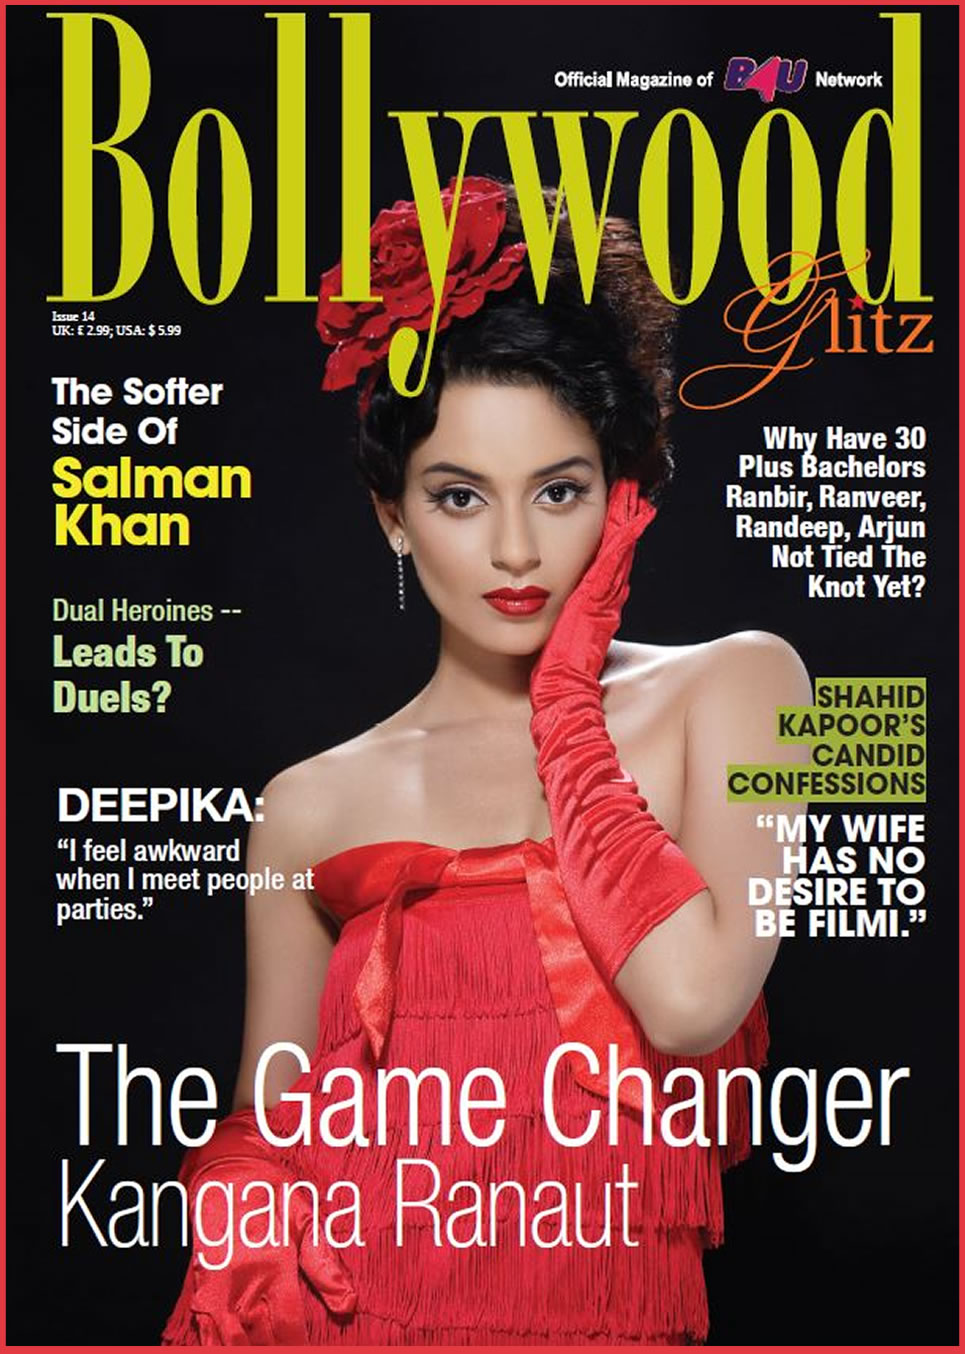 B4u Bollywood Glitz Returns With A Kangana Exclusive!